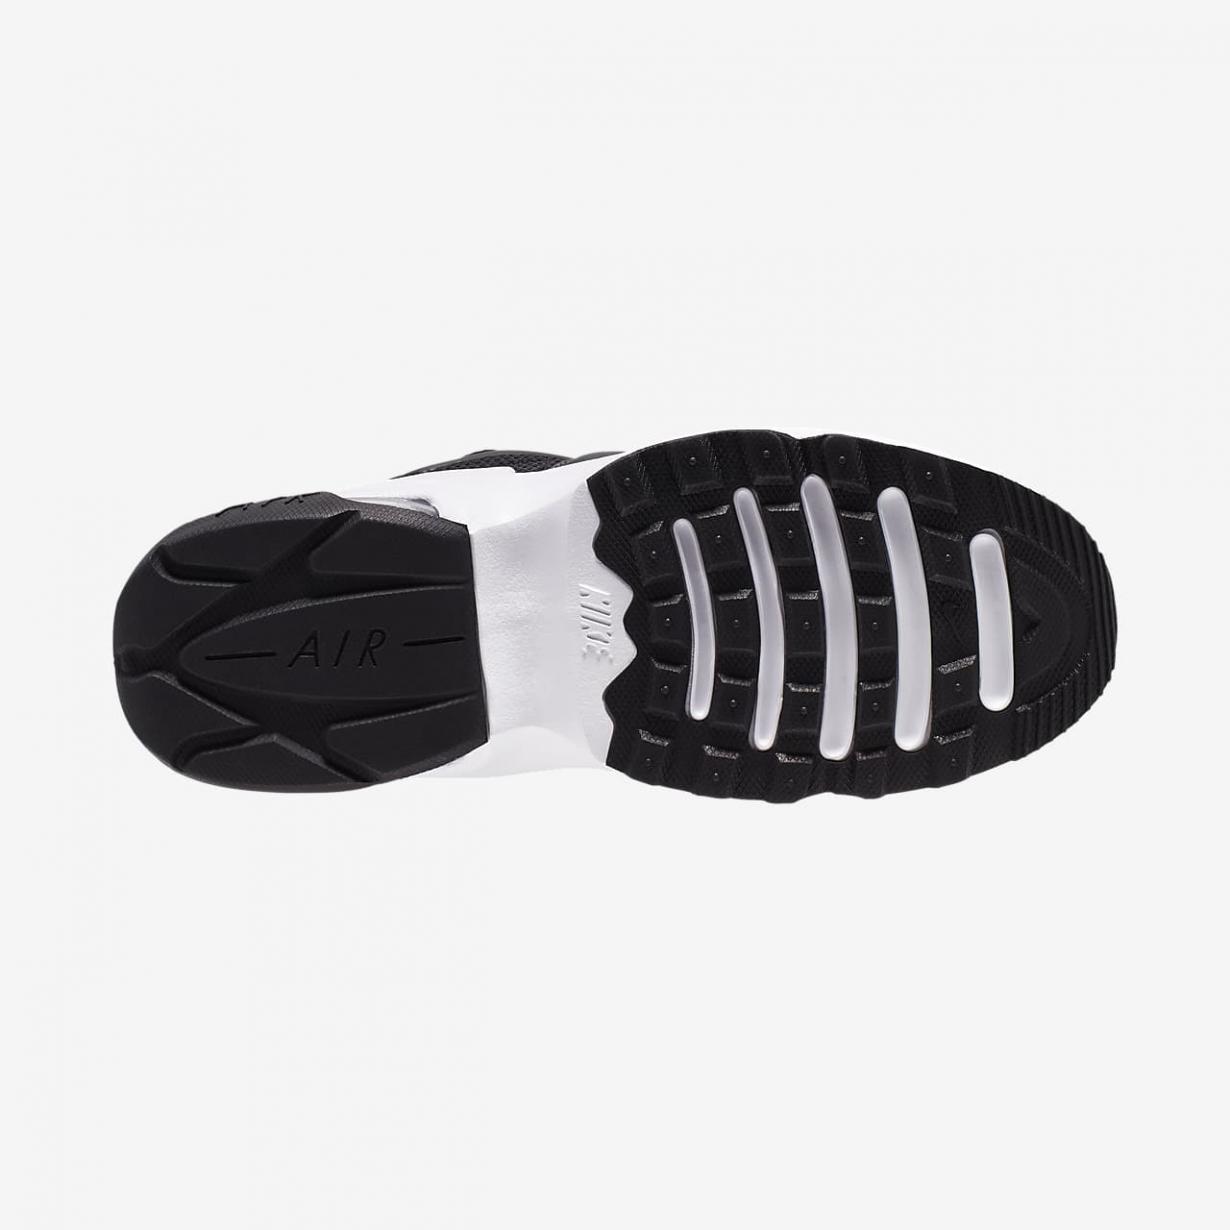 Lifestyle Homme   Air Max Graviton Anthracite/Noir/Blanc/Volt   Nike < Gooddaytricities